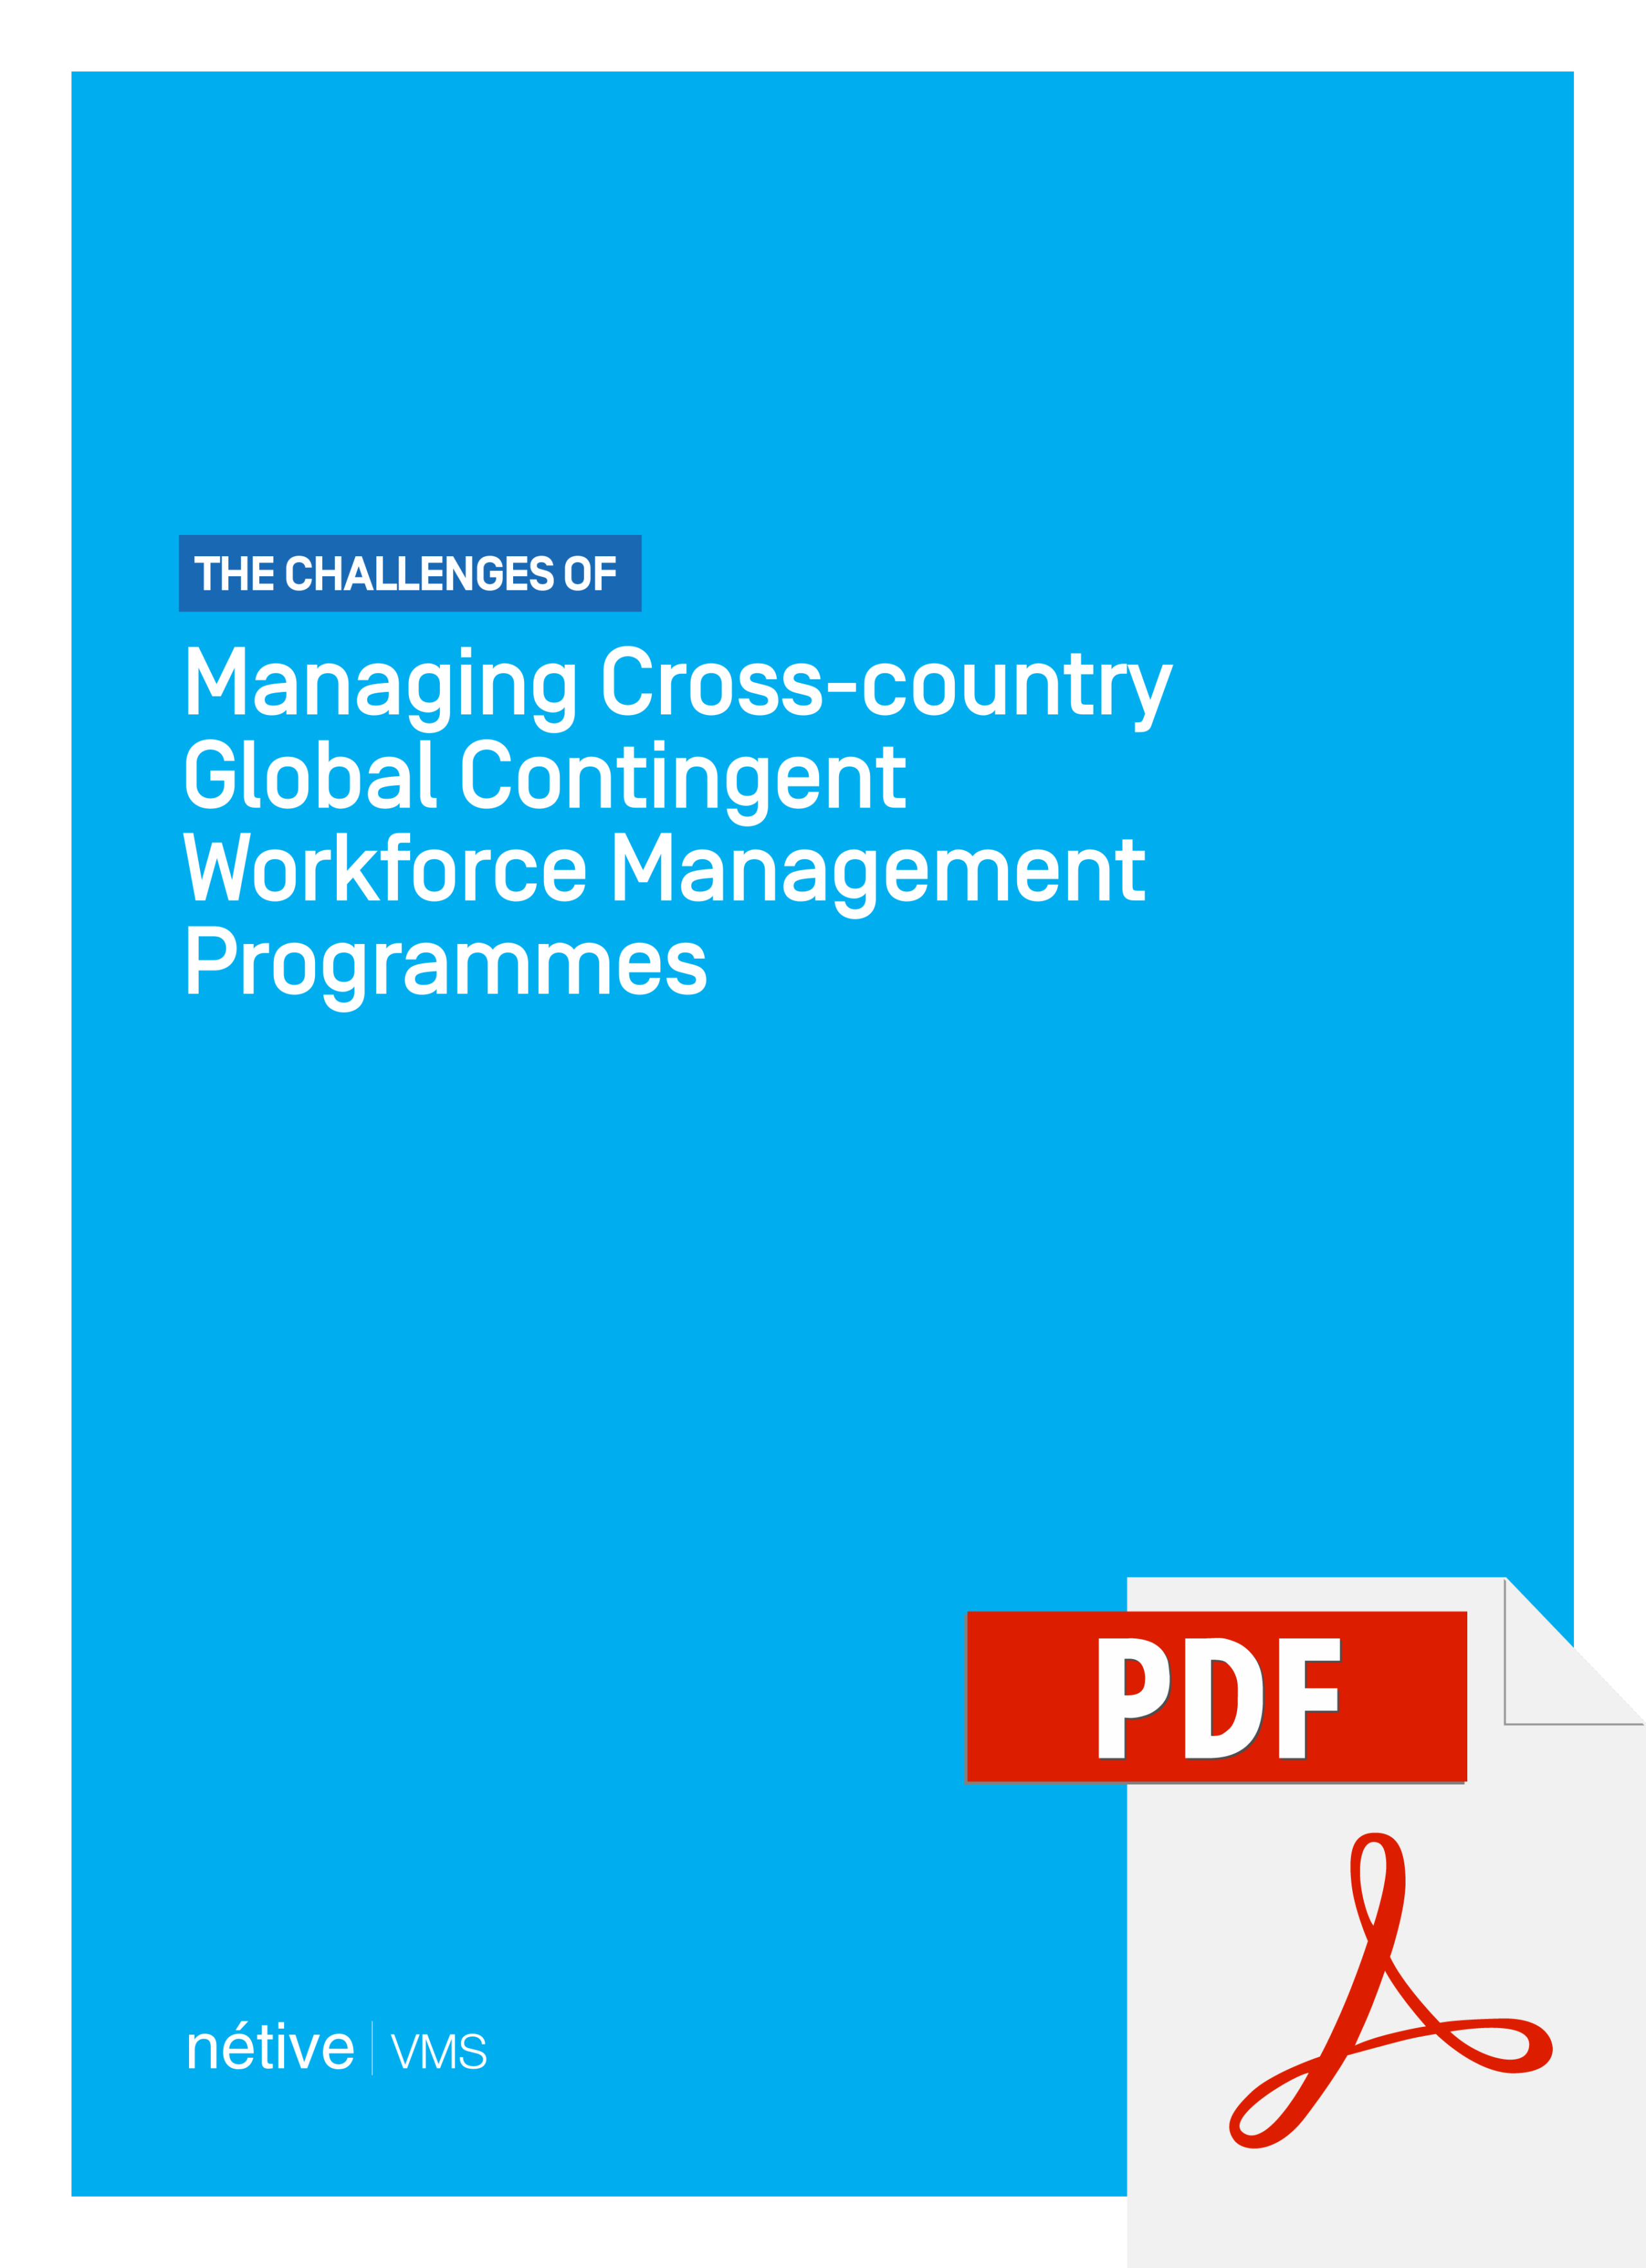 Nétive VMS – international contingent workforce management